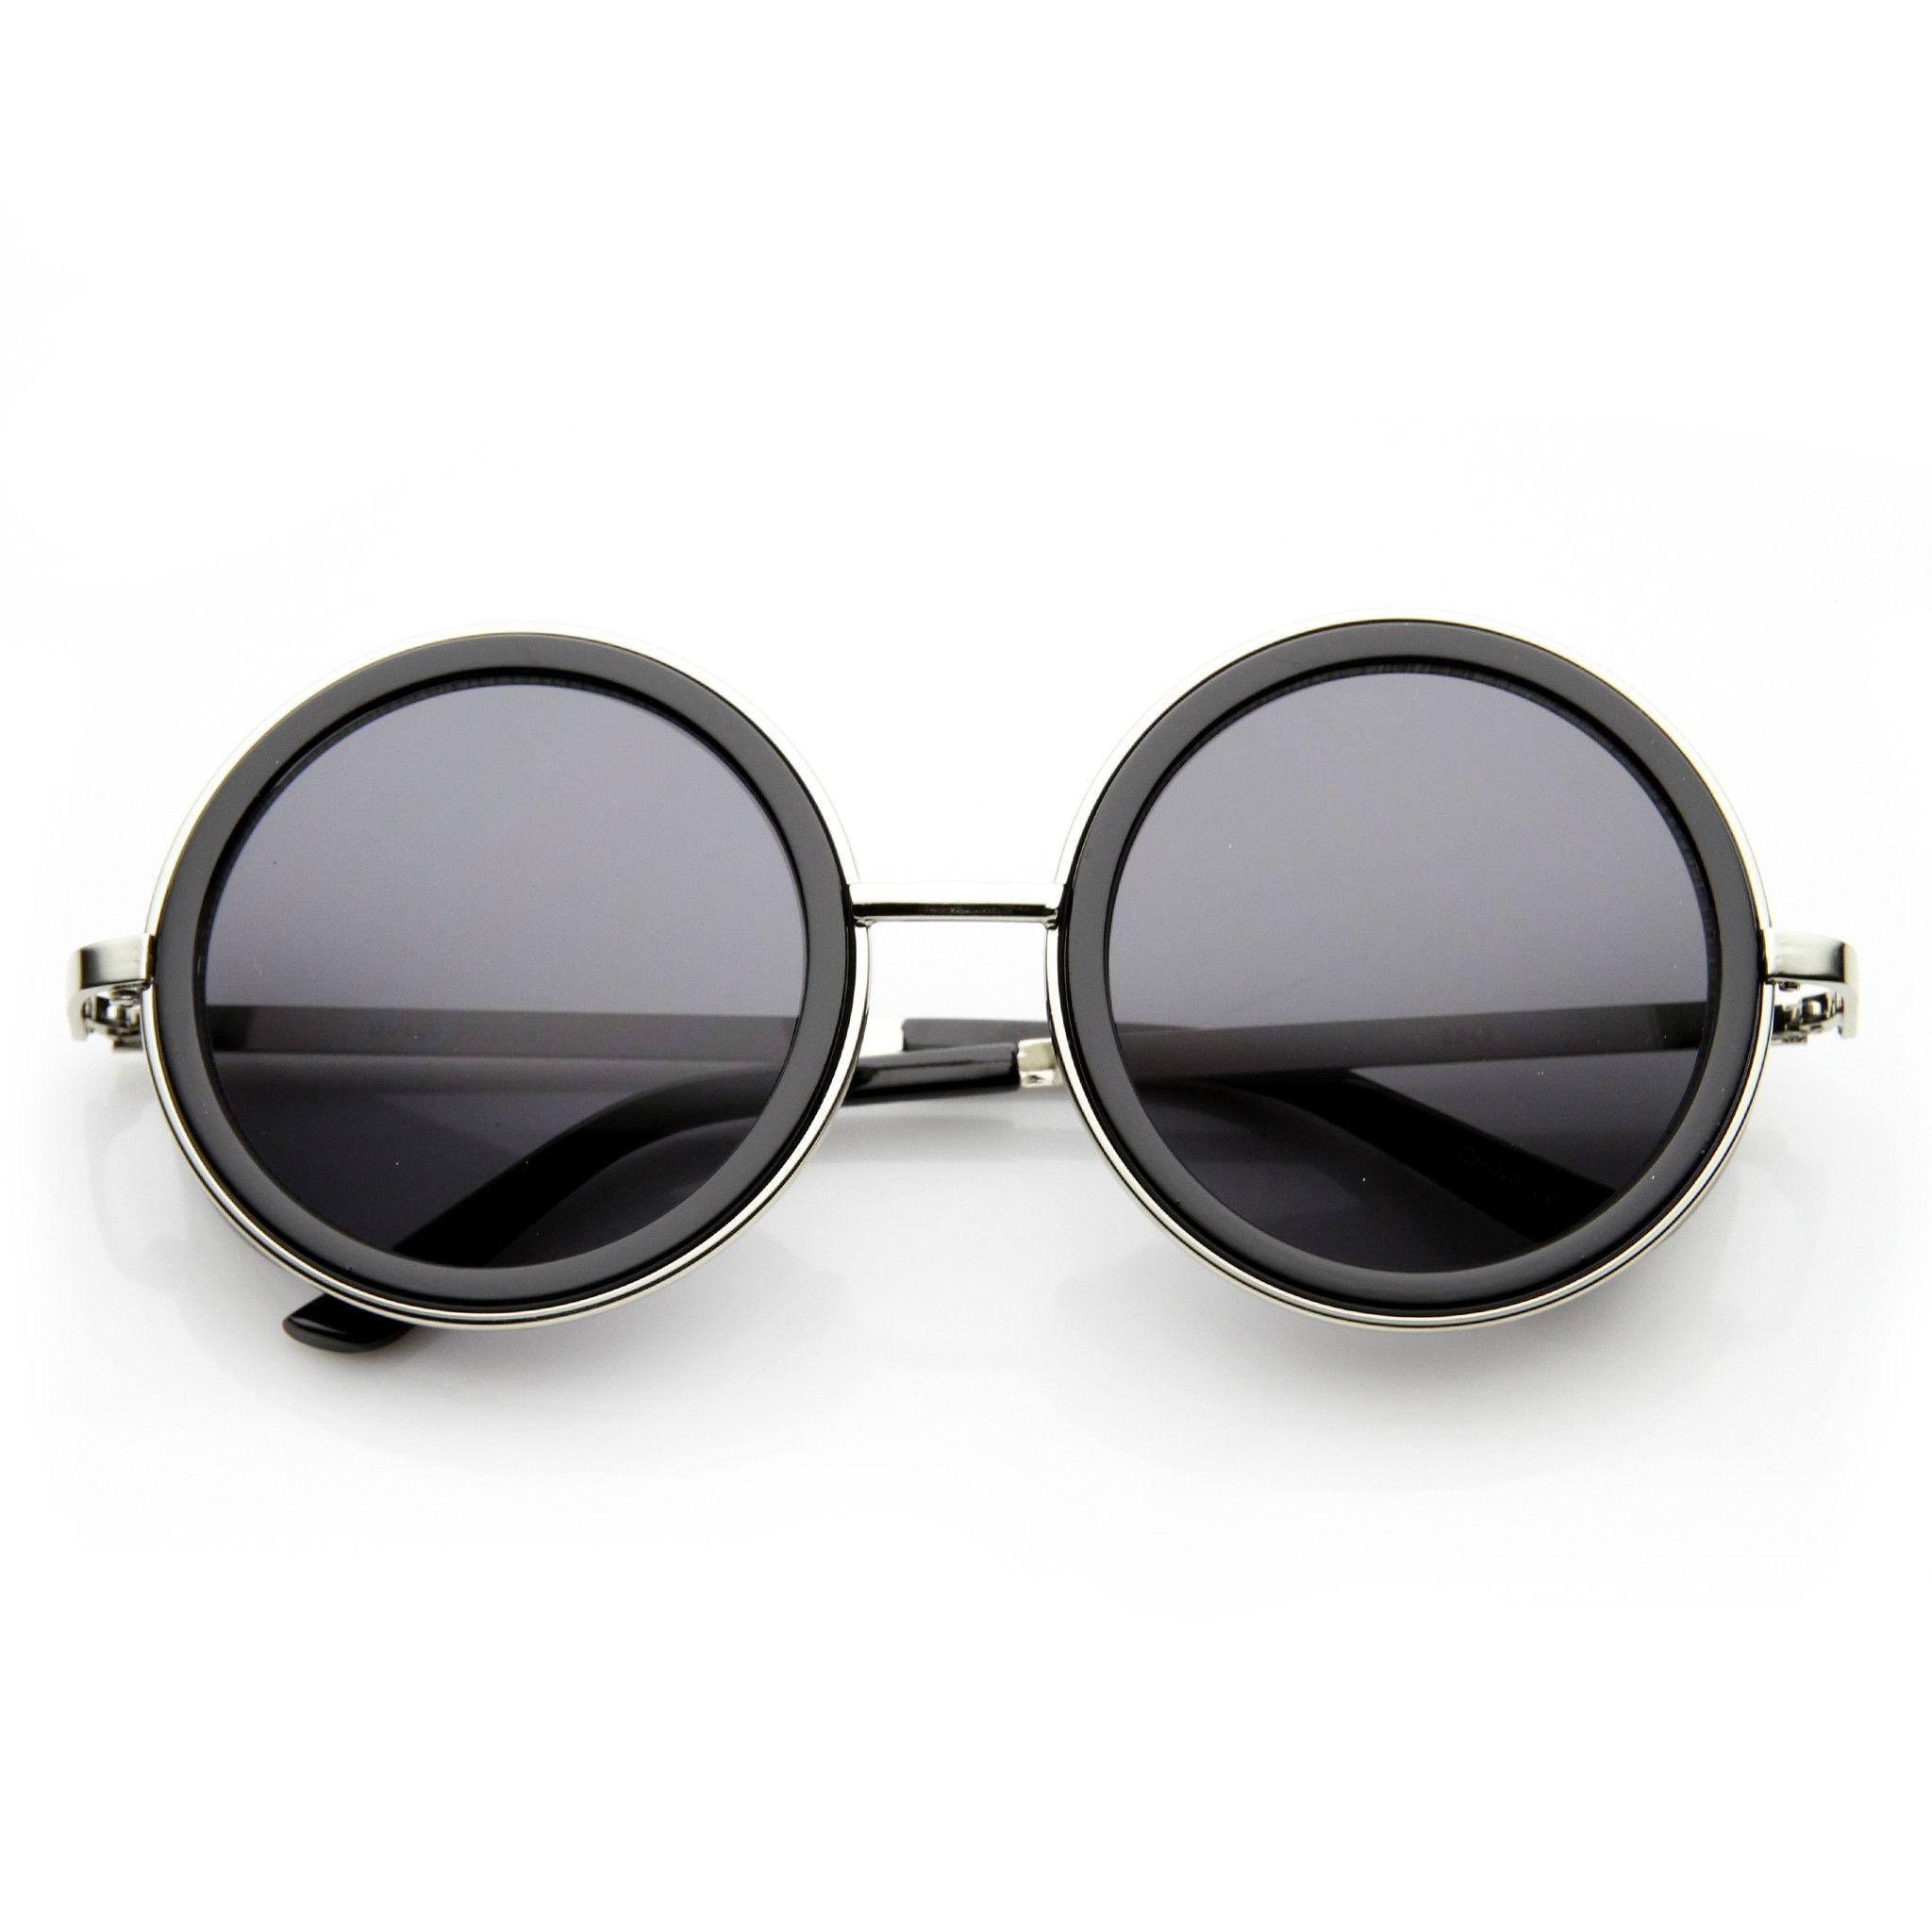 d5ac132b9 oakley Sunglasses #oakley #Sunglasses ! 2015 Women Fashion Style From USA  Glasses Online.love and to buy it! oakley Sunglasses outlet online #Oakley  famous ...